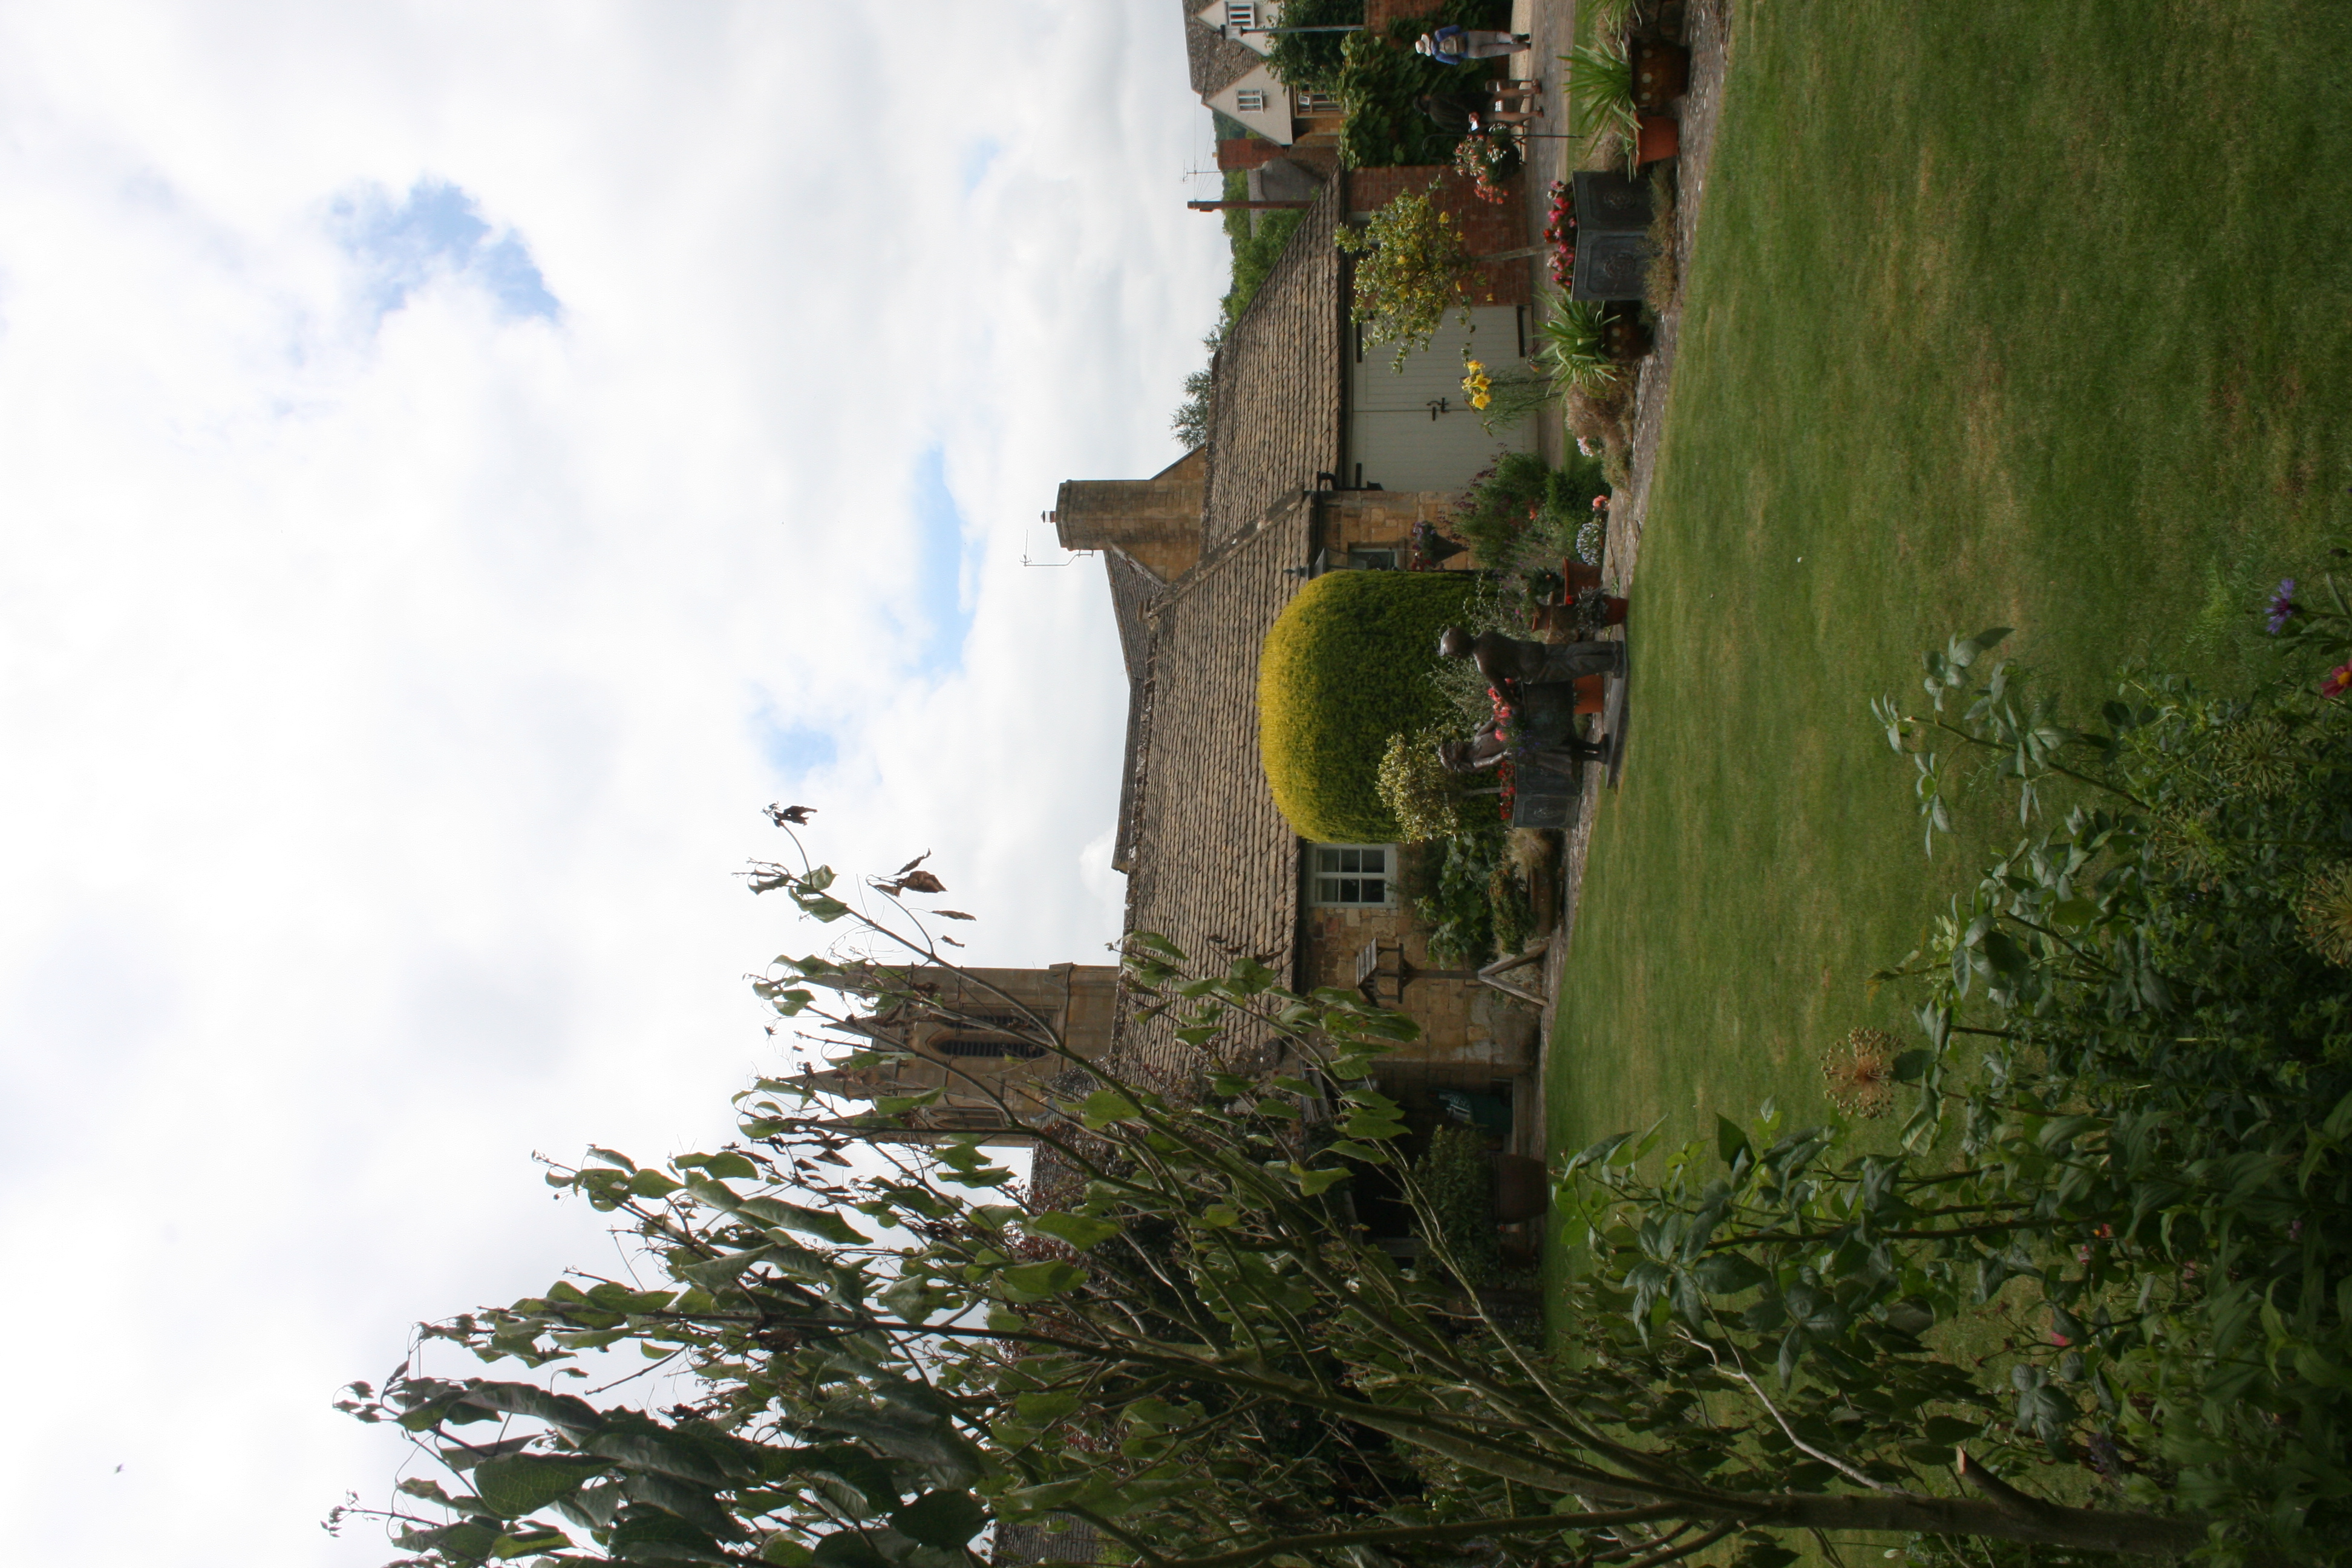 Kylsant House